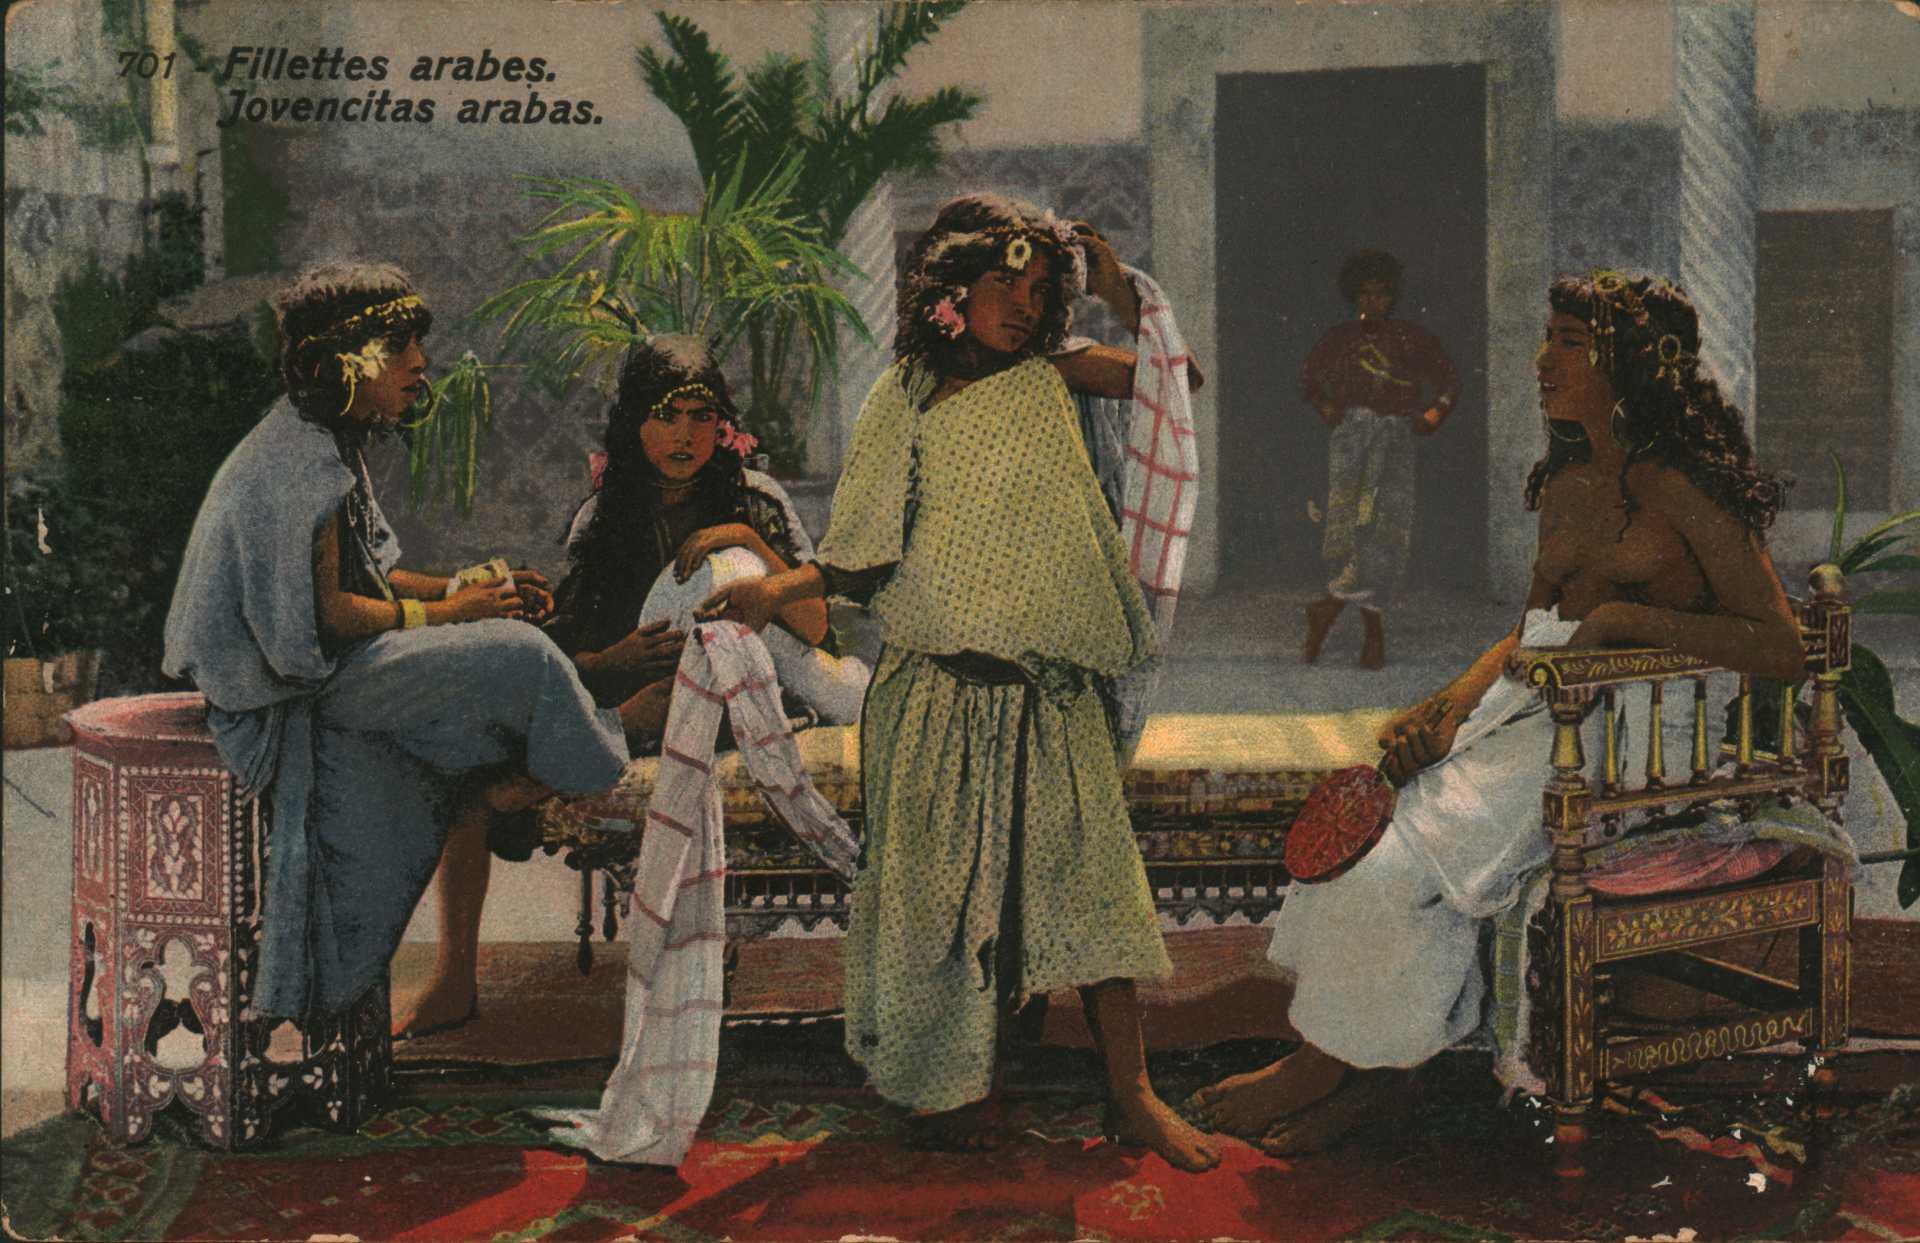 Fillettes arabes. Jovencitas arabas